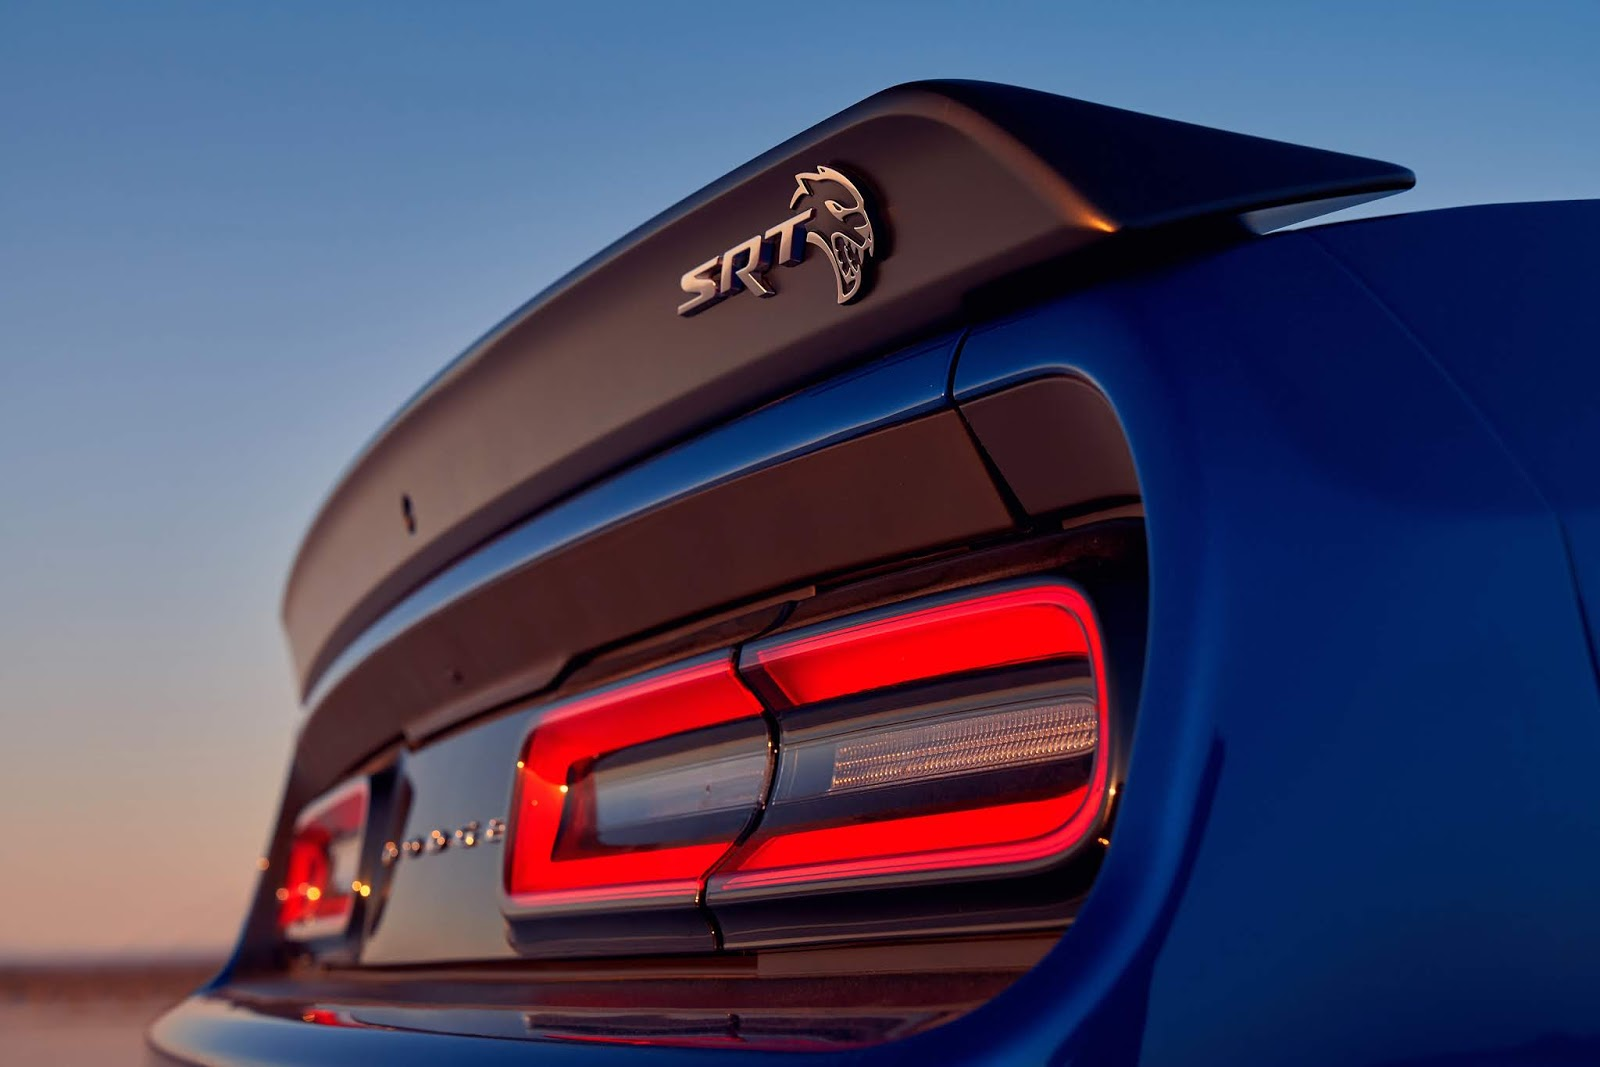 Beauty In The Details 2019 Dodge Challenger Srt Hellcat Redeye